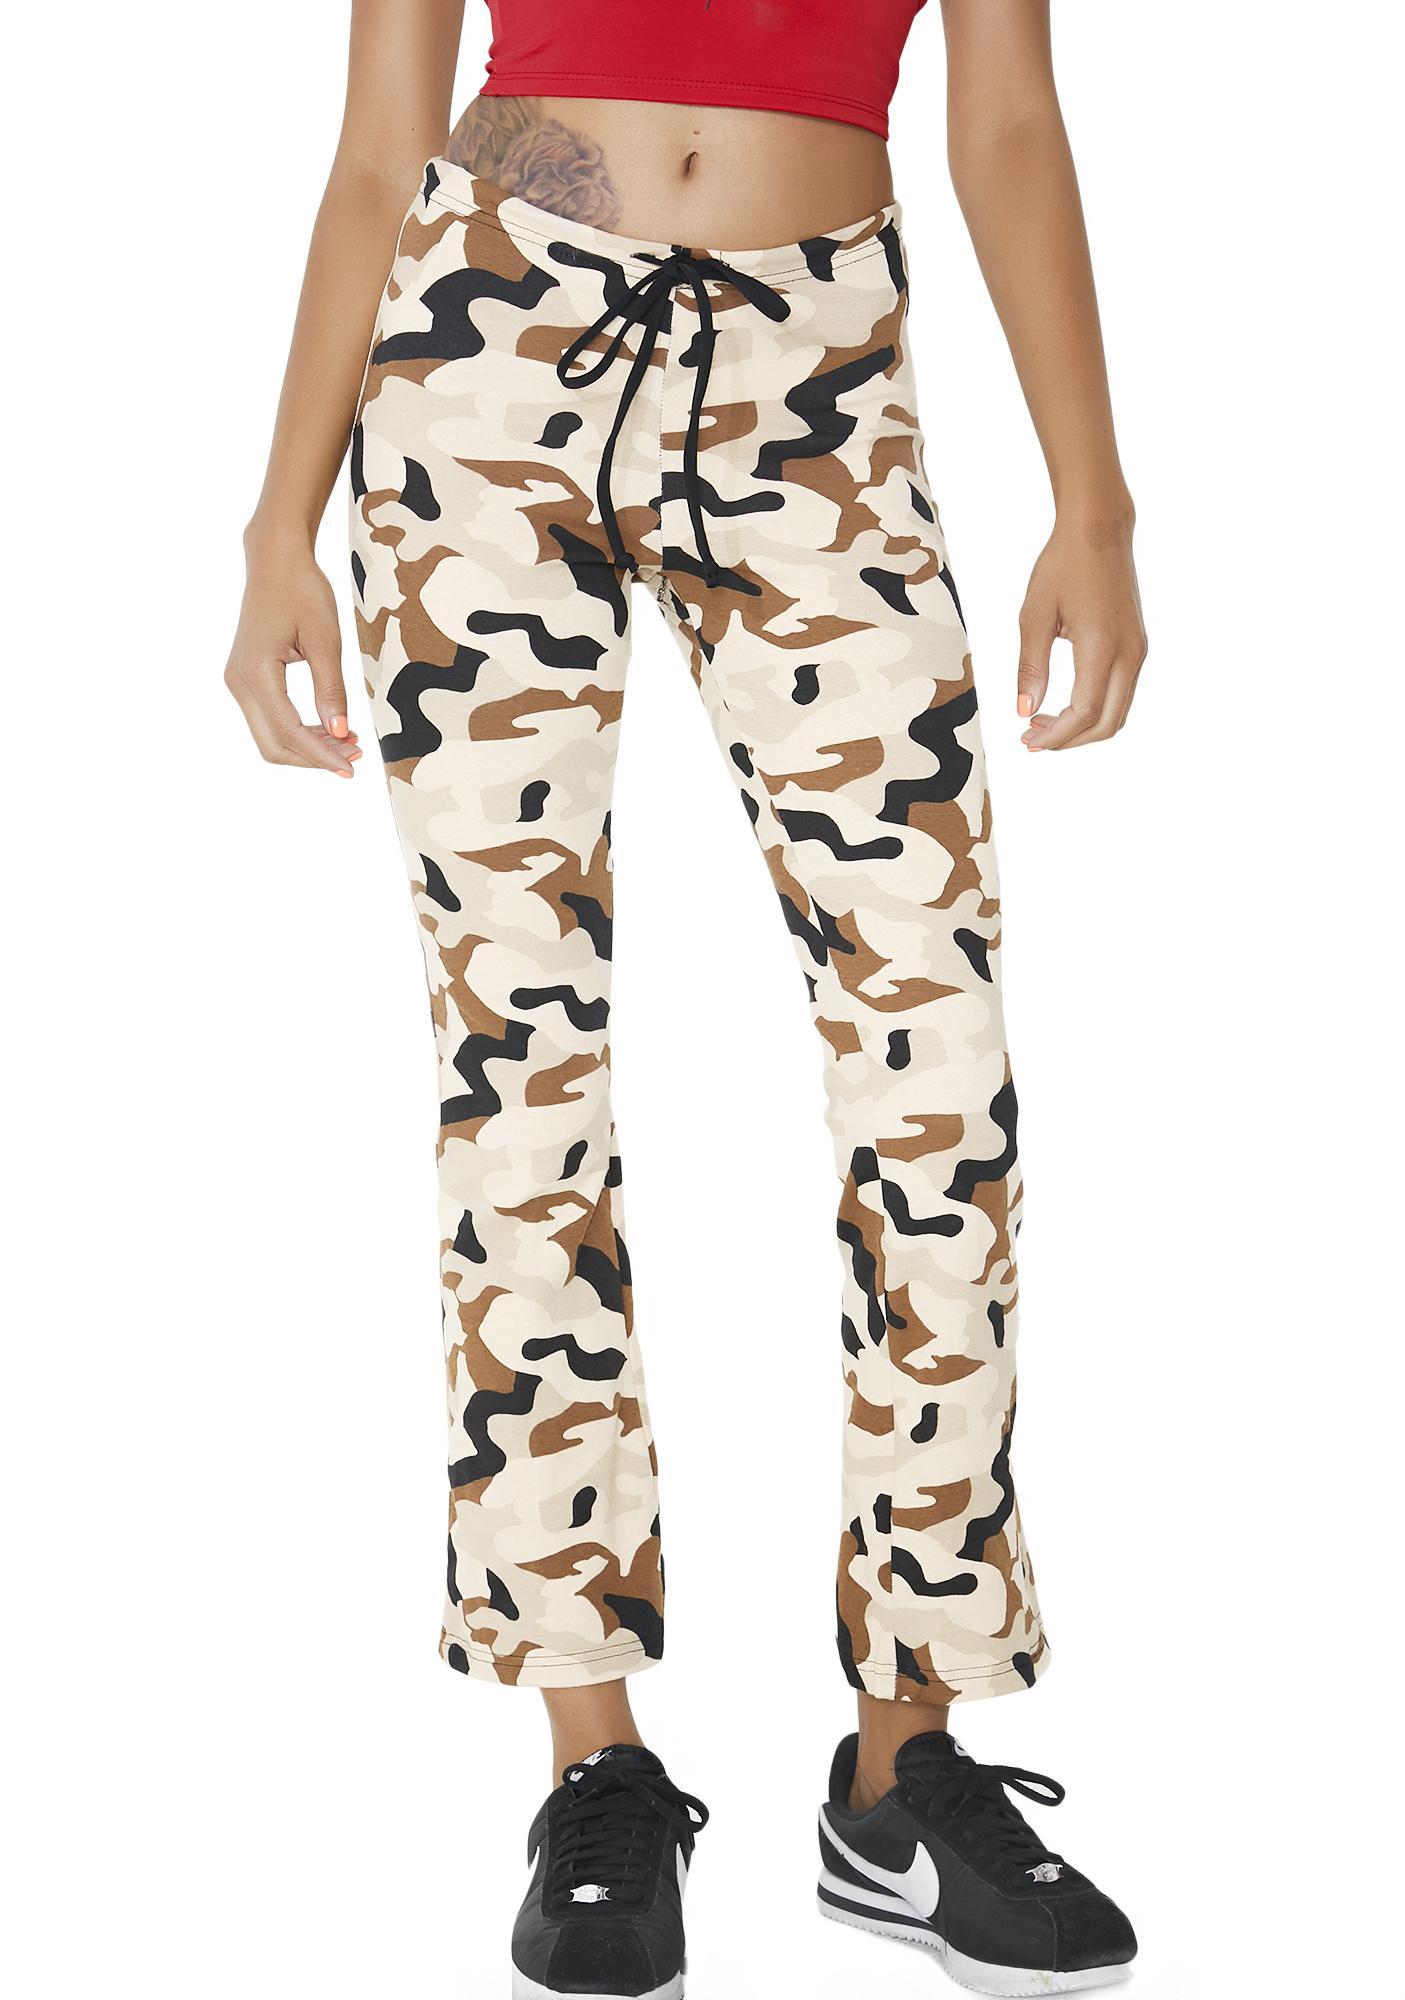 American Deadstock Duty Calls Camo Flare Pants